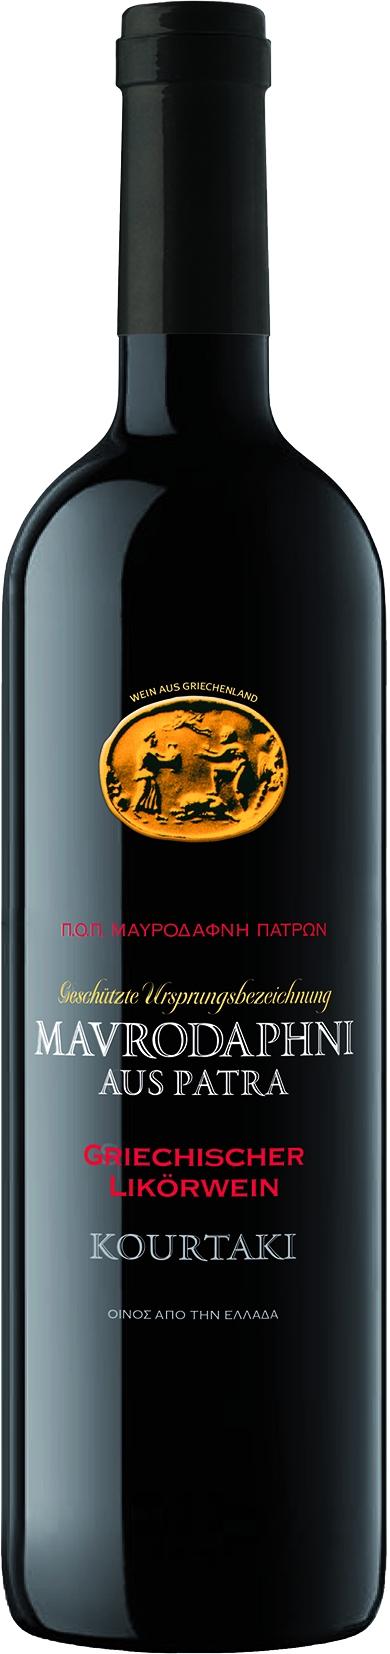 Mavrodaphne aus Patras Likoerwein